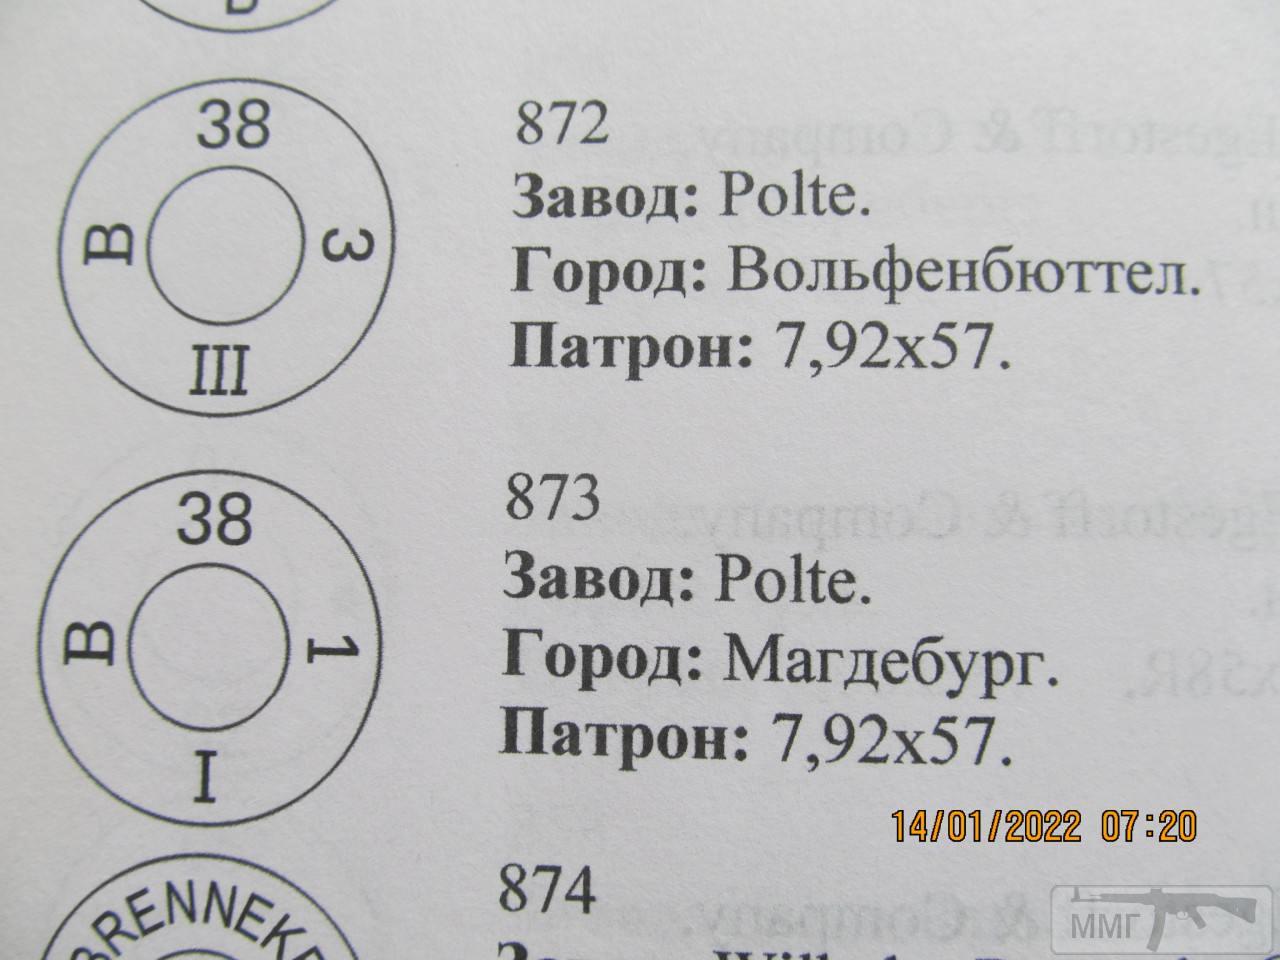 98859 - Патрон 7,92x57 «Маузер» - виды, маркировка, история